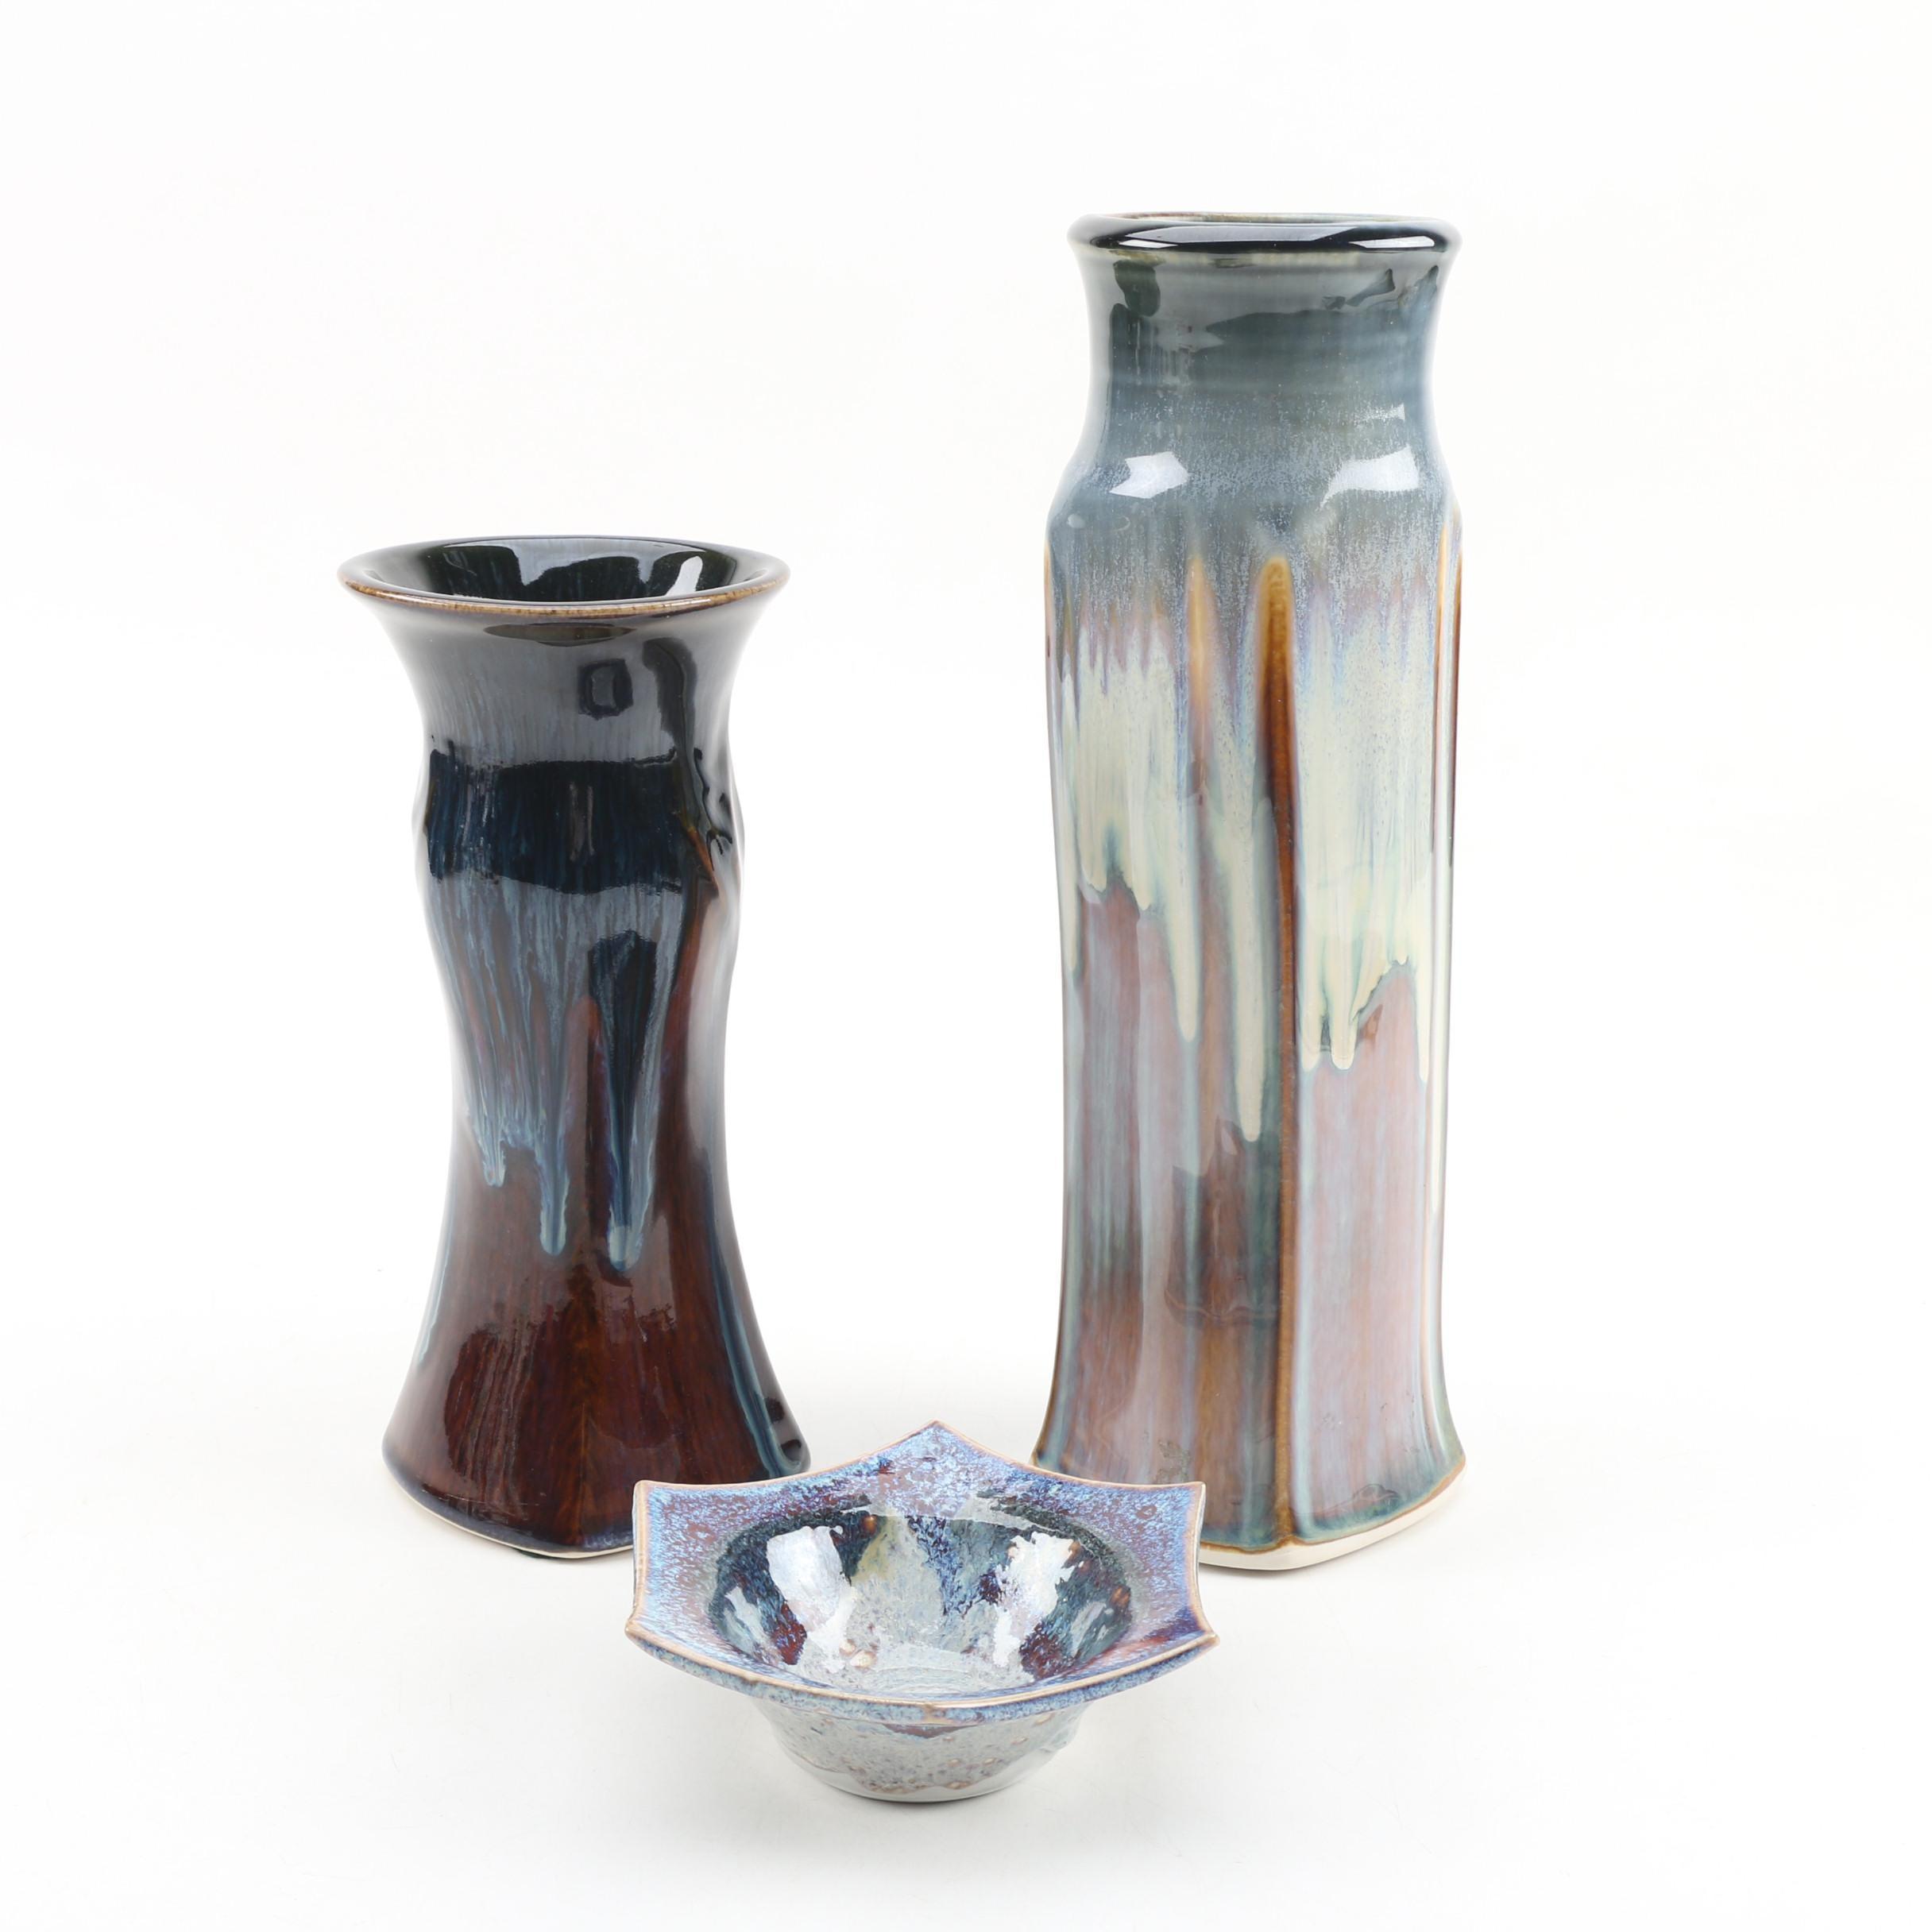 Thrown Mayhew Beersheba Porcelain Bowl with Drip Glazed Porcelain Vases